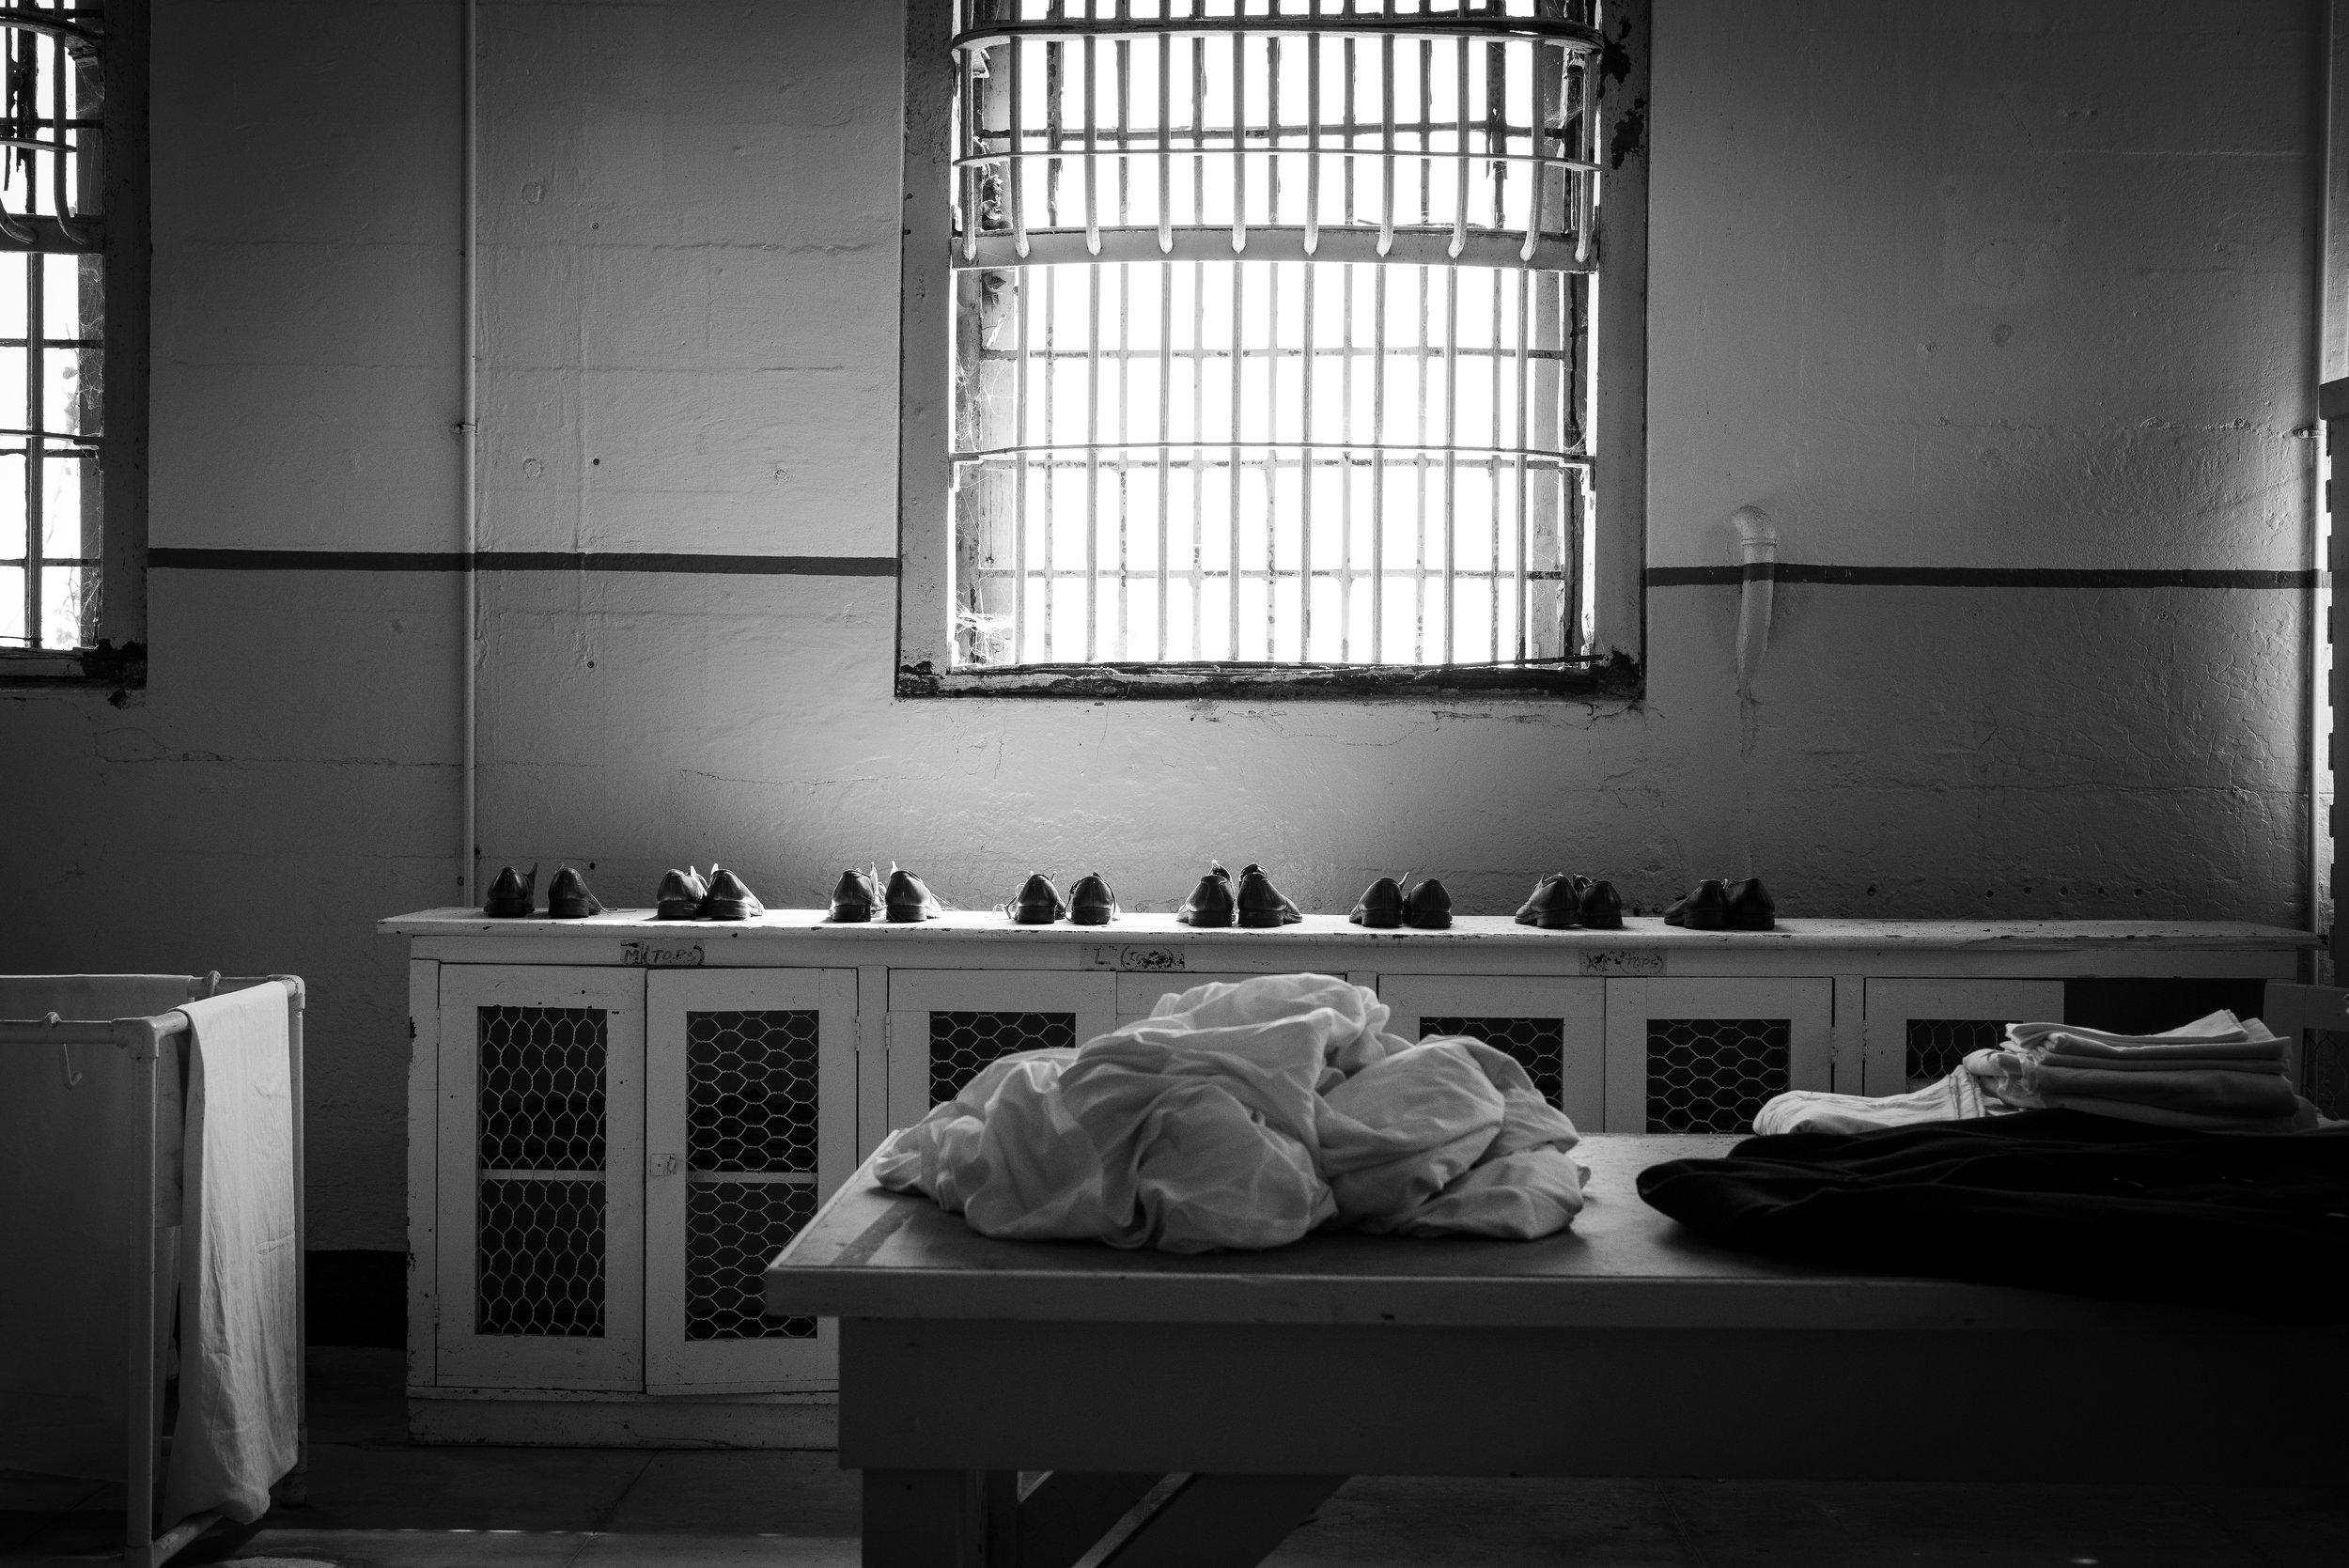 Prison's receiving room